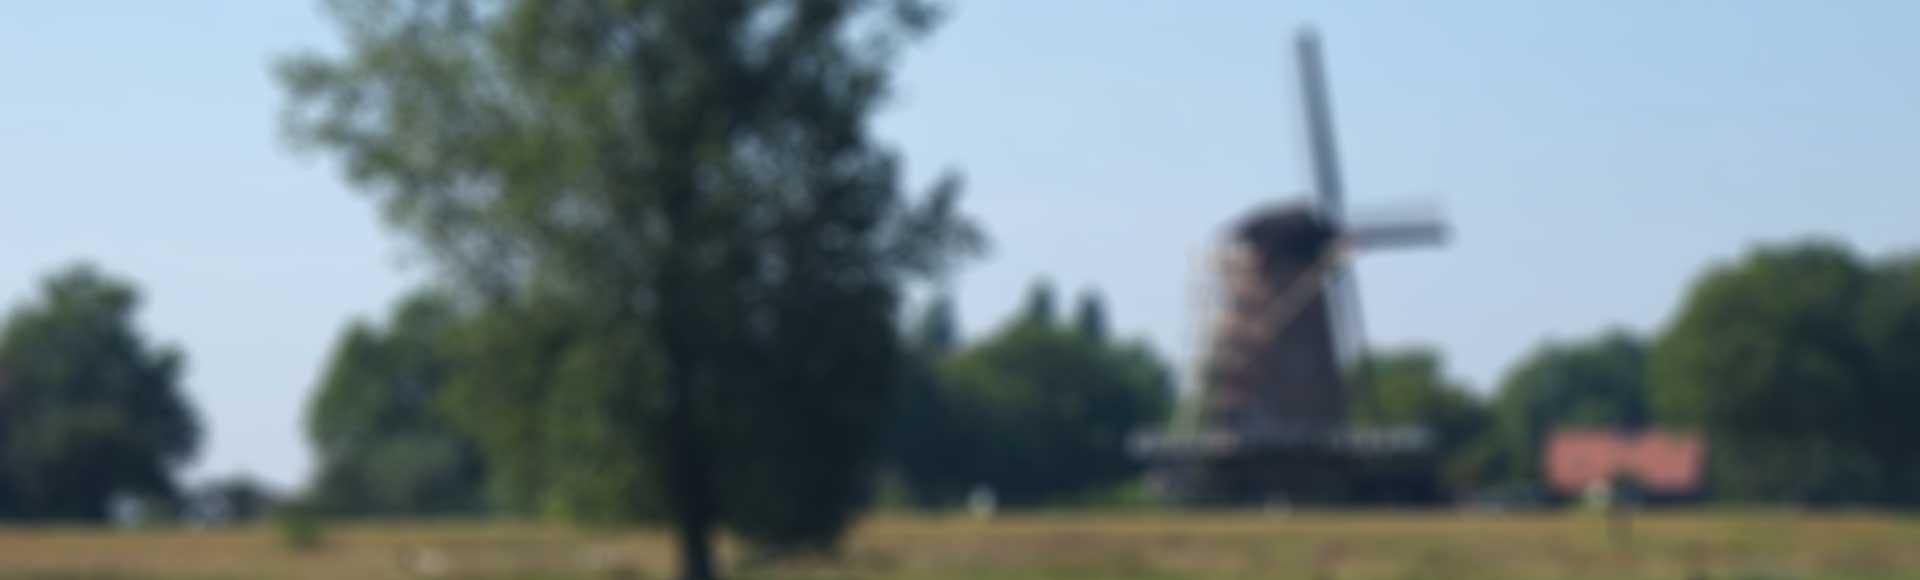 Welkom bij Stichting Dagbesteding Maaspark.